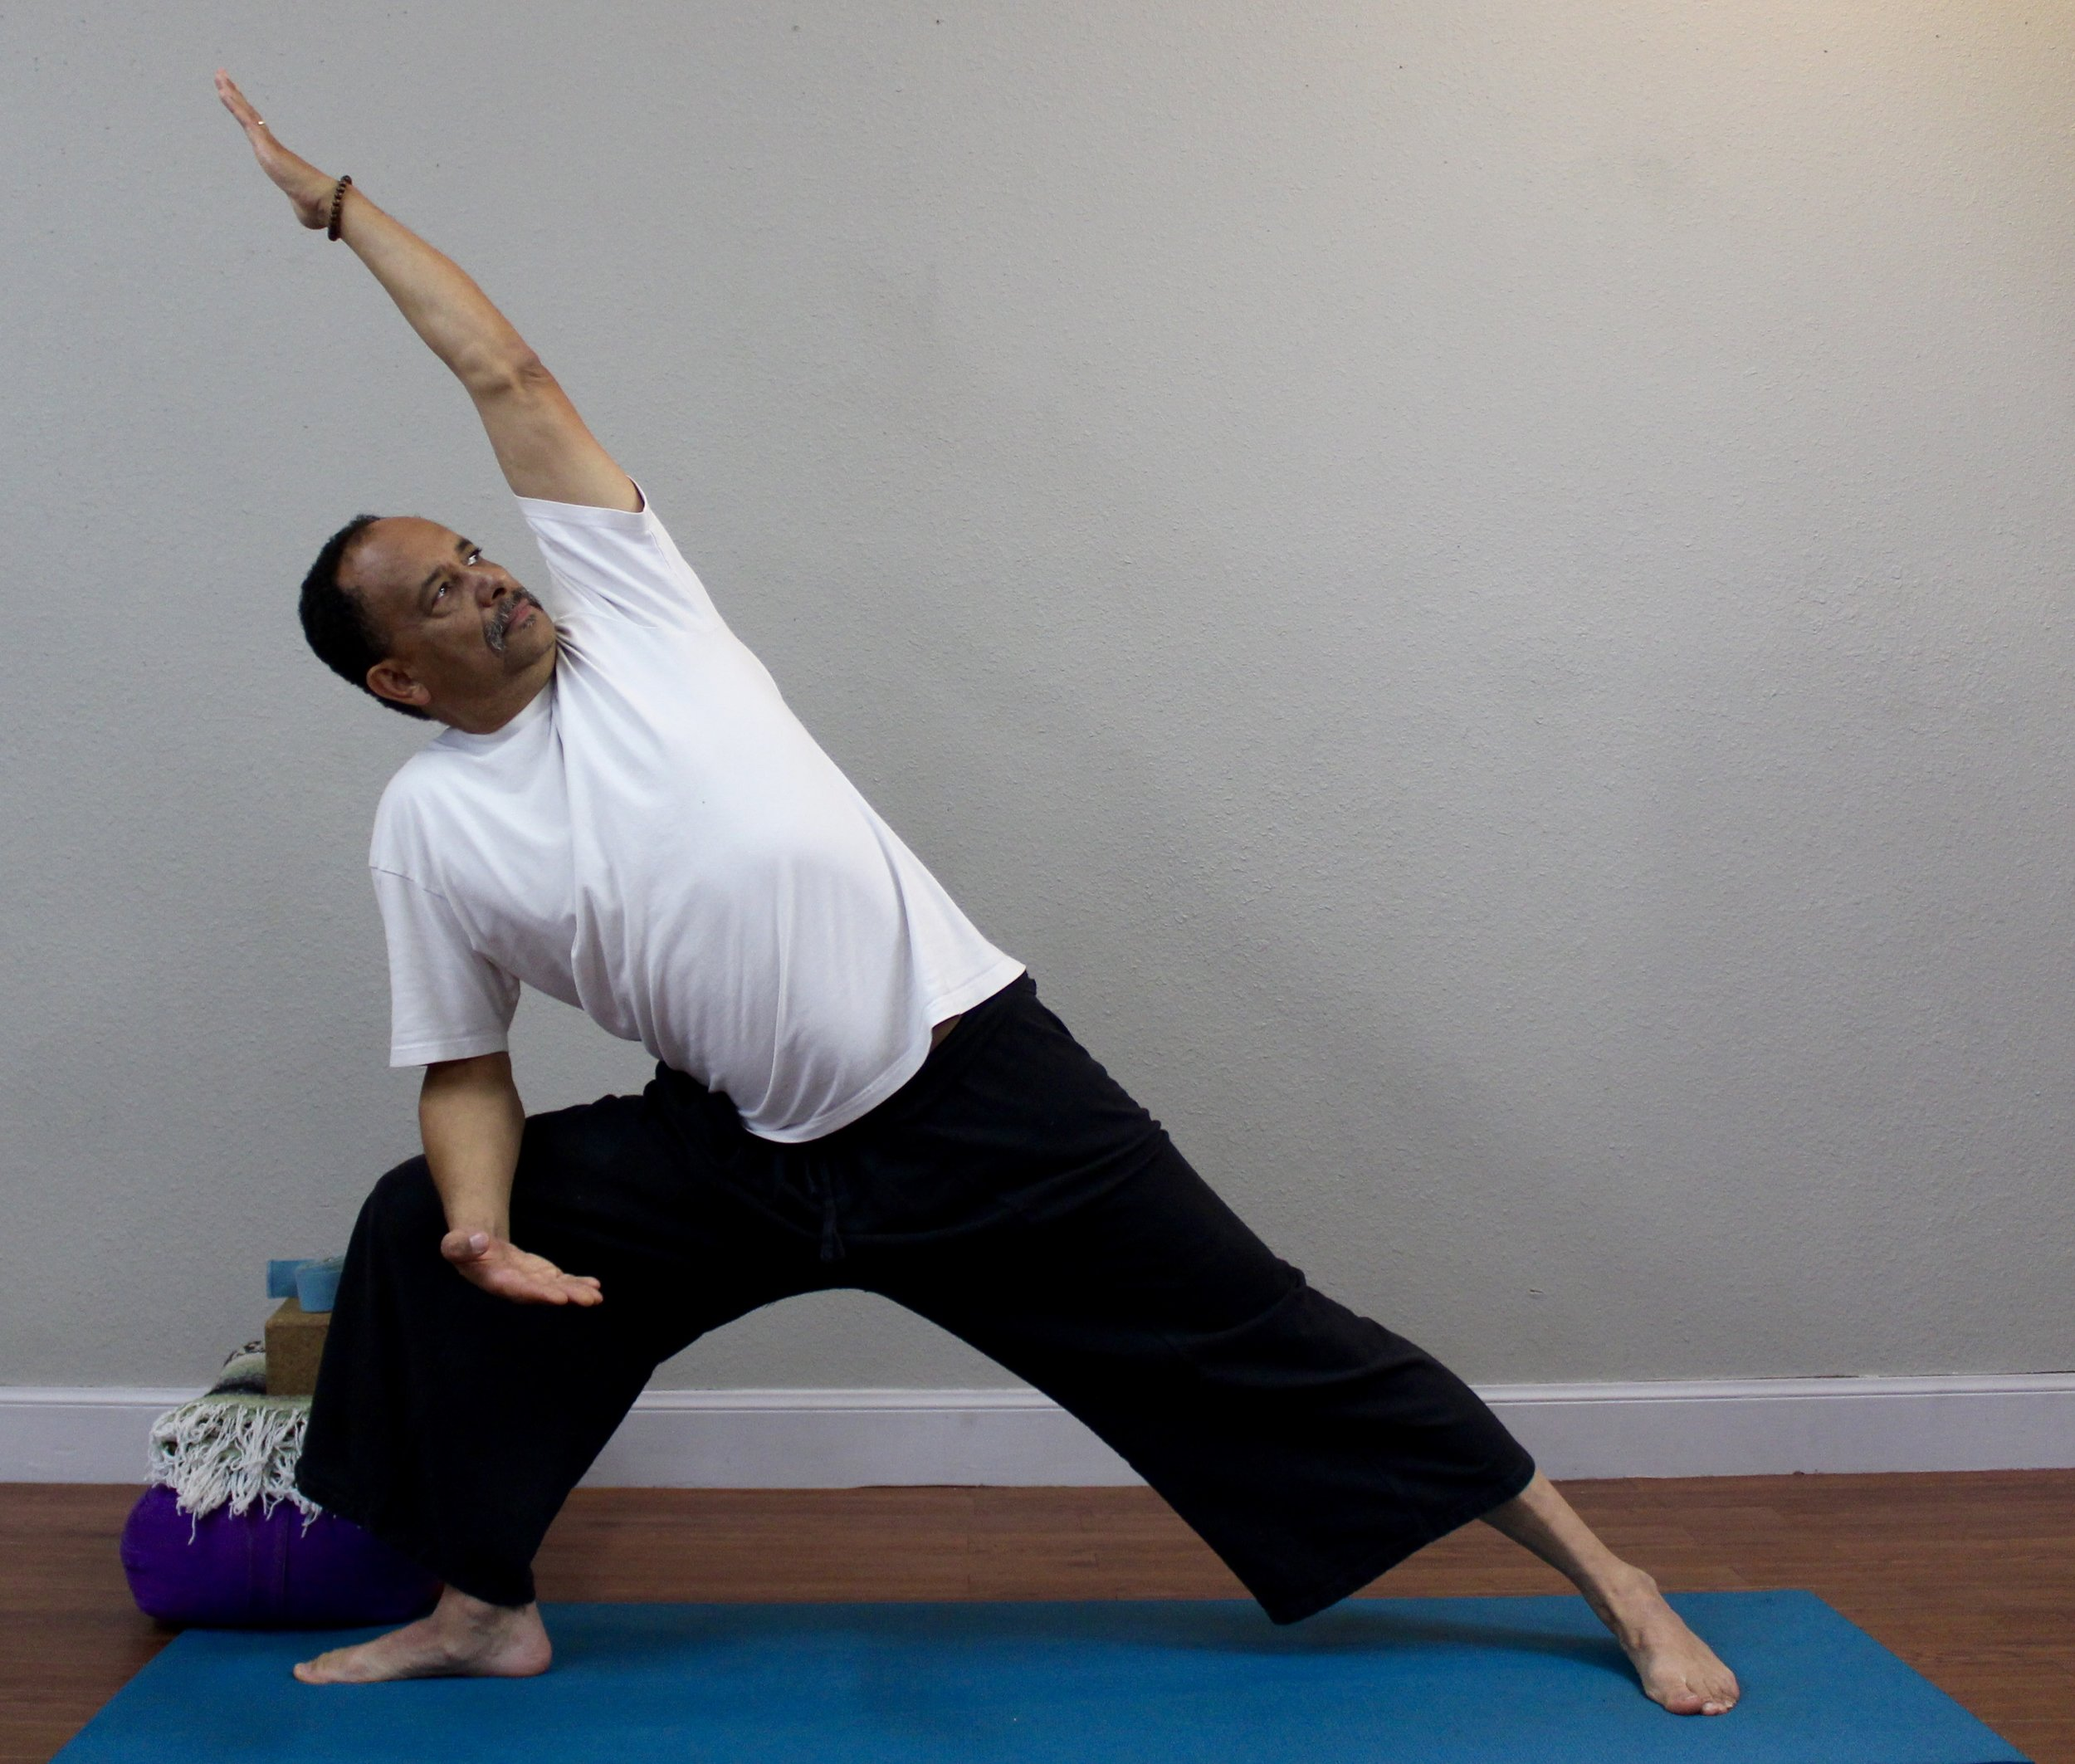 @curobjr  Curtis teaches Mindfulness Meditation Saturdays at 8:30 a.m.